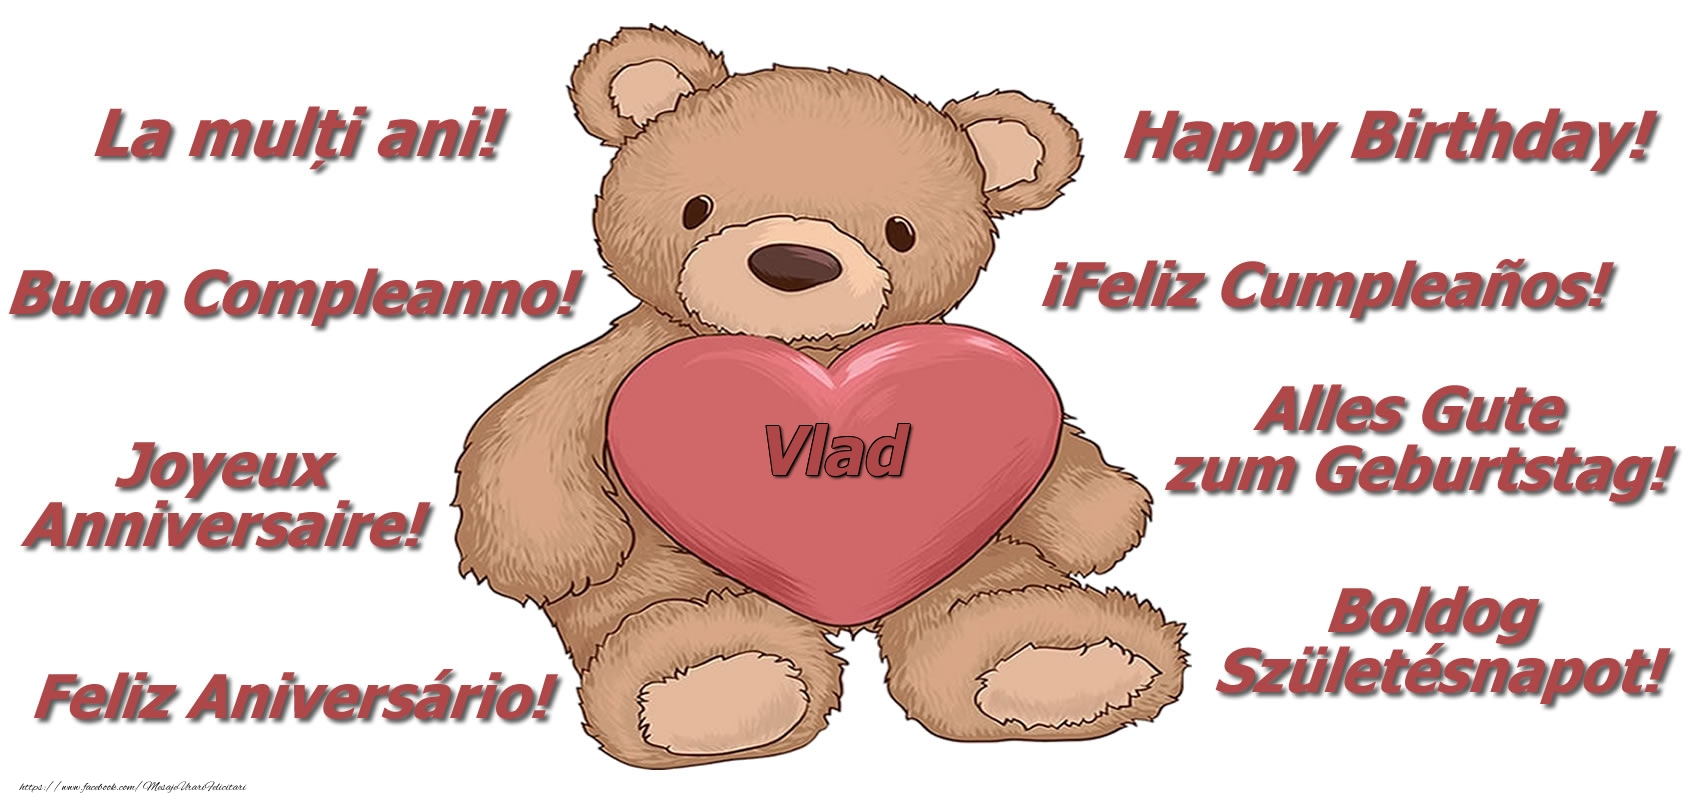 Felicitari de zi de nastere - La multi ani Vlad! - Ursulet